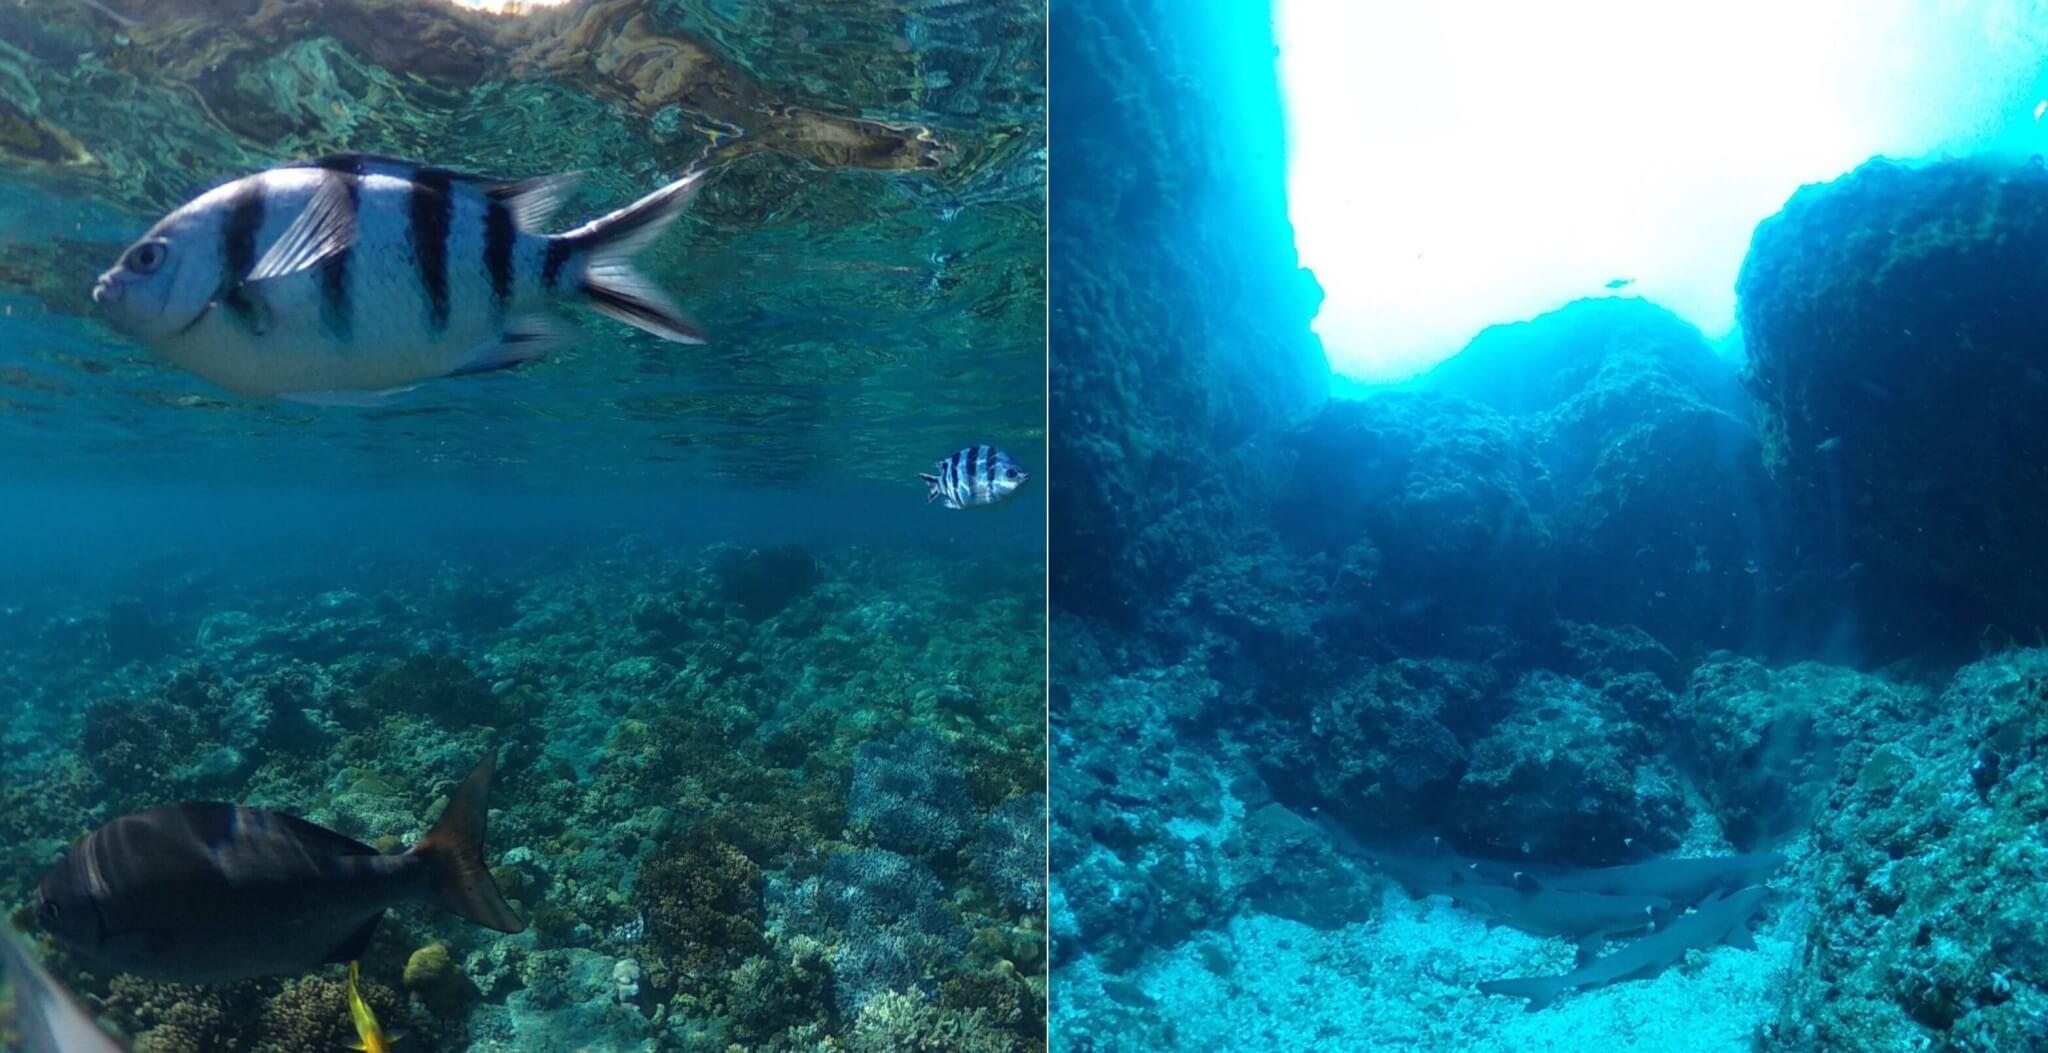 THETAの水中撮影を実際に試してわかった注意点やコツ青かぶり補正はない